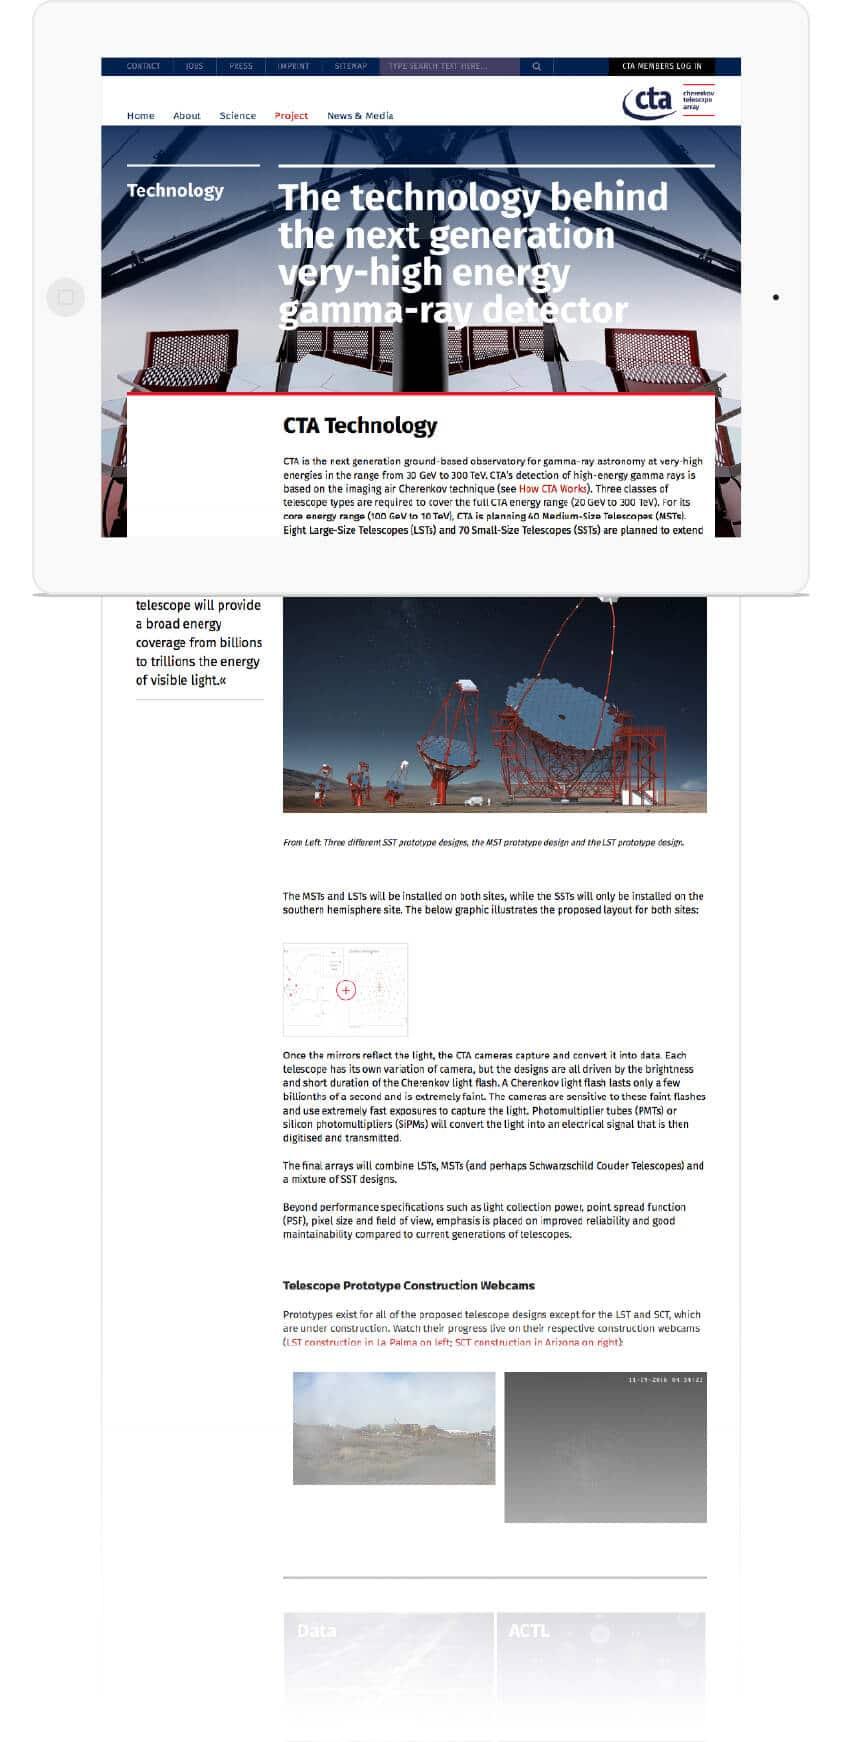 360VIER_CTAO_Image-02 Cherenkov Telescope Array Observatory Gmbh